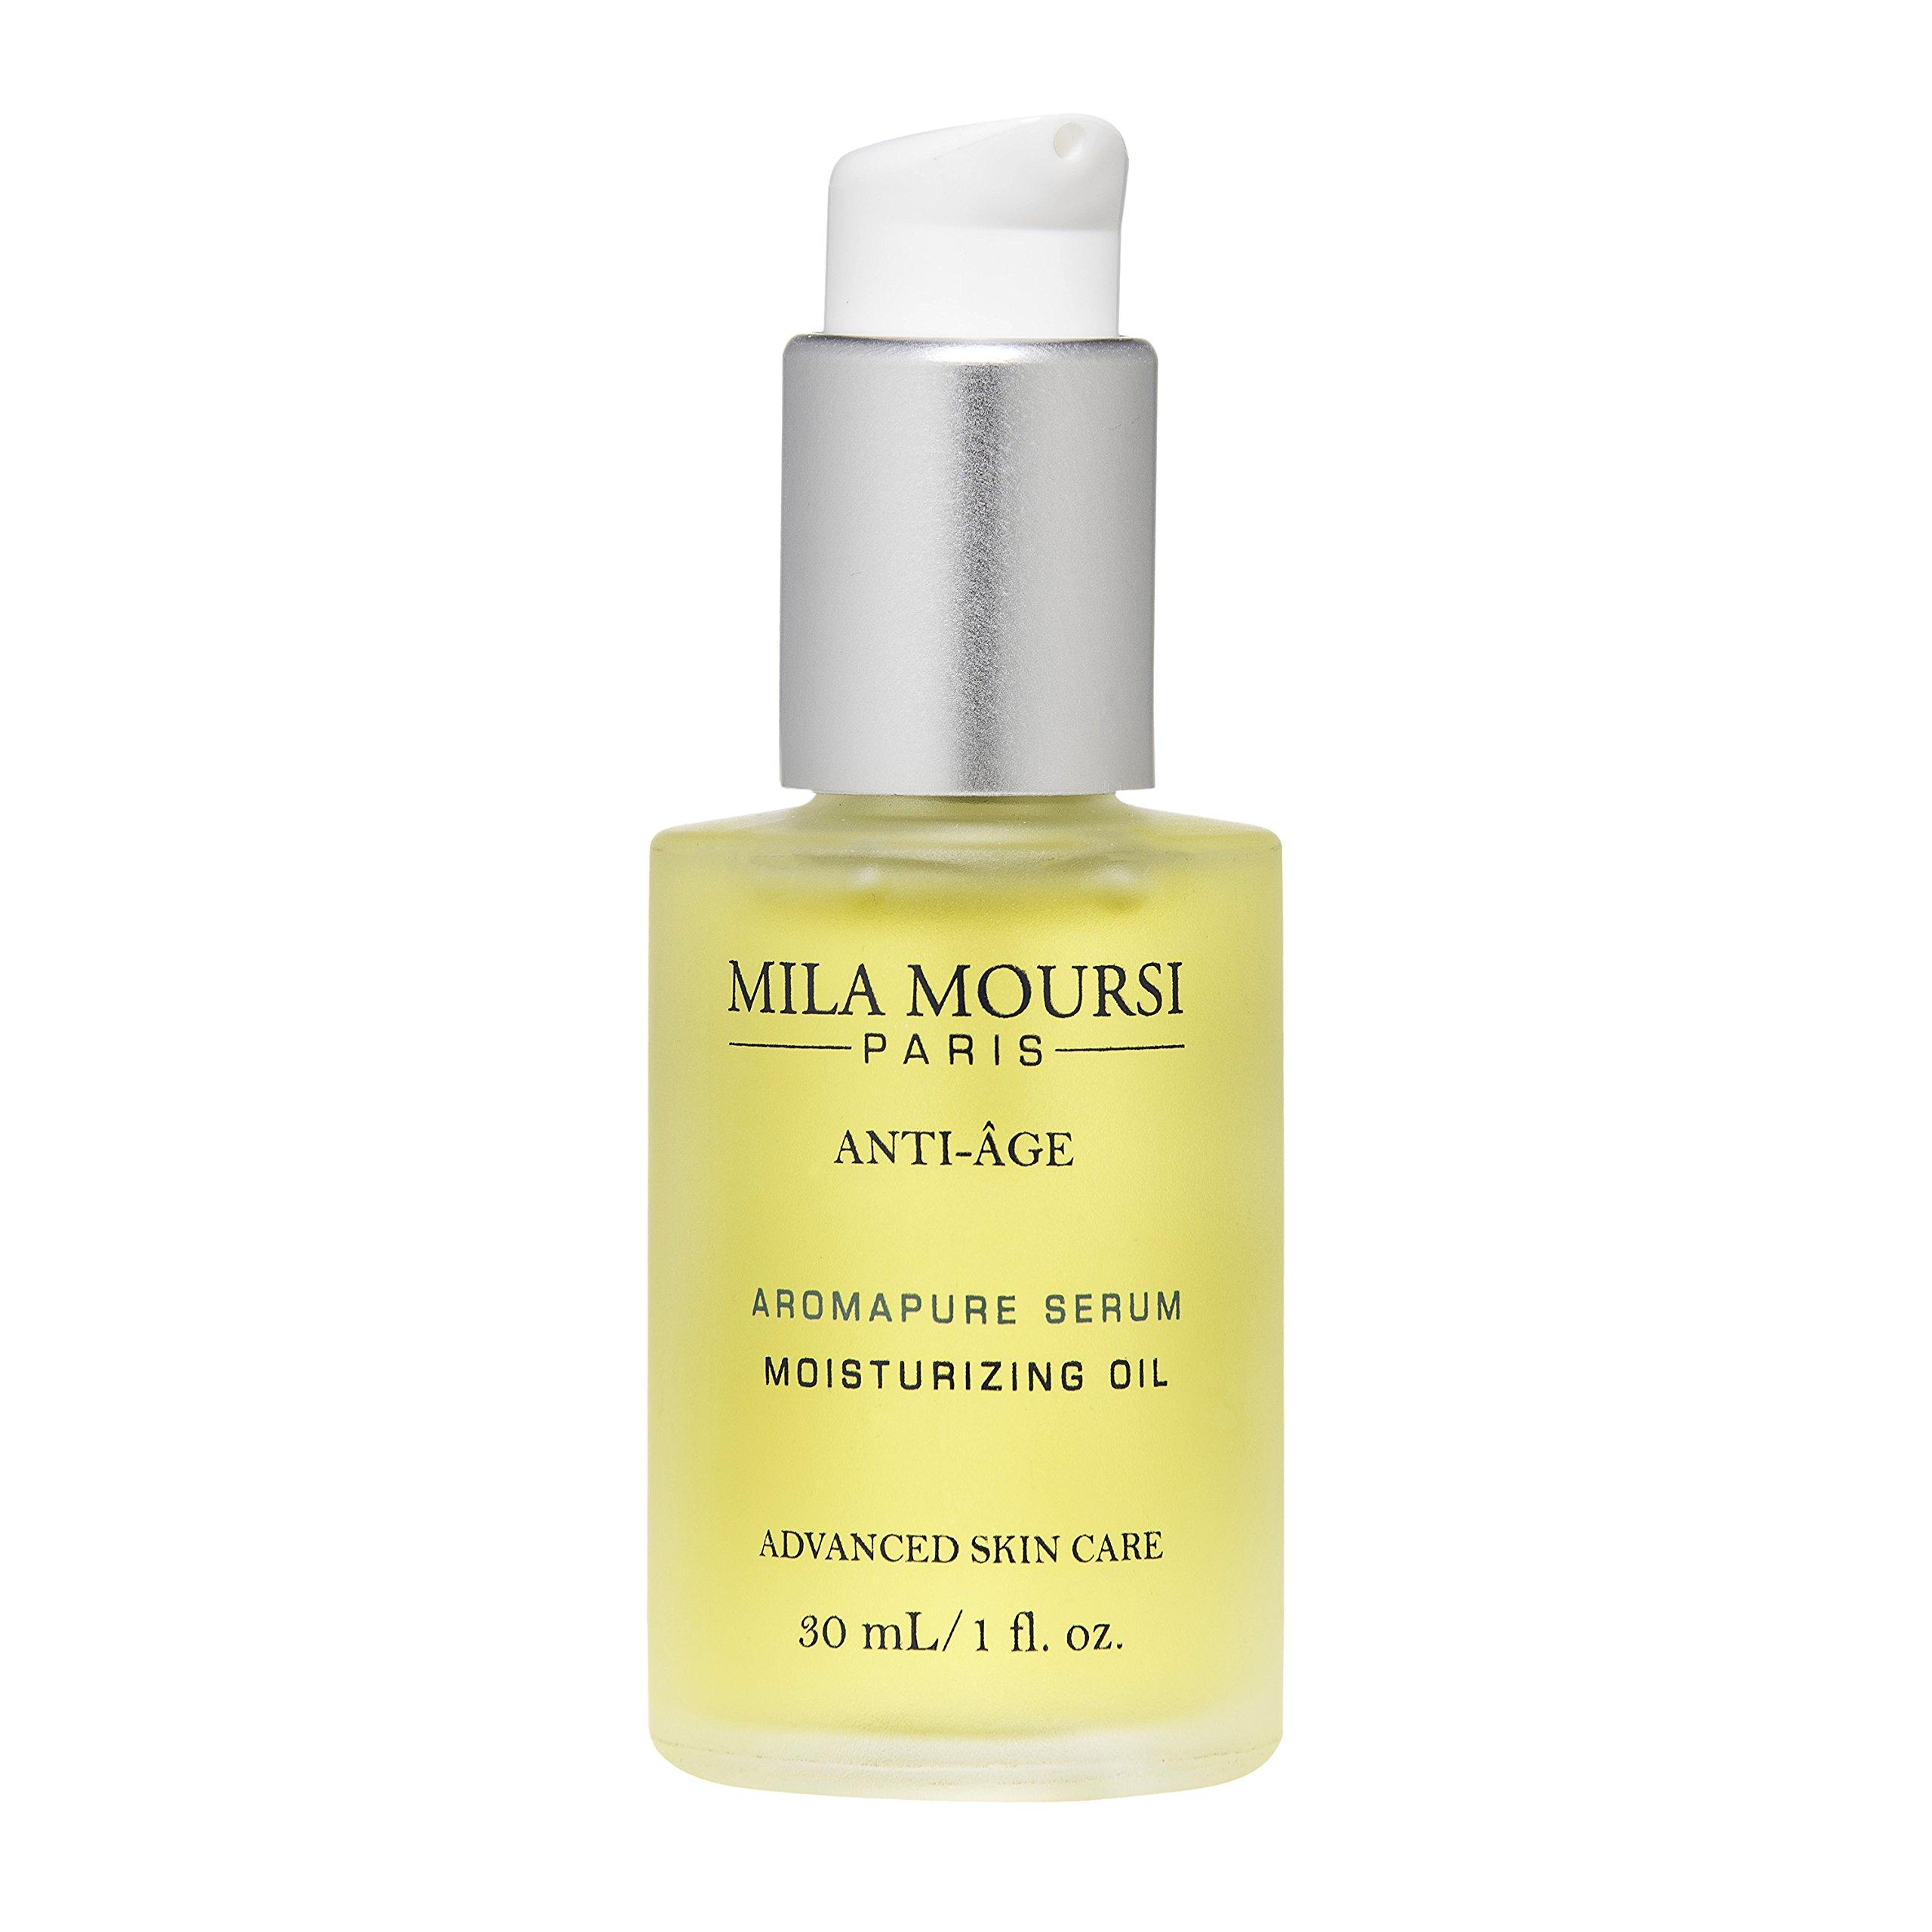 Mila Moursi Moisturizing Oil, 1 Fl Oz